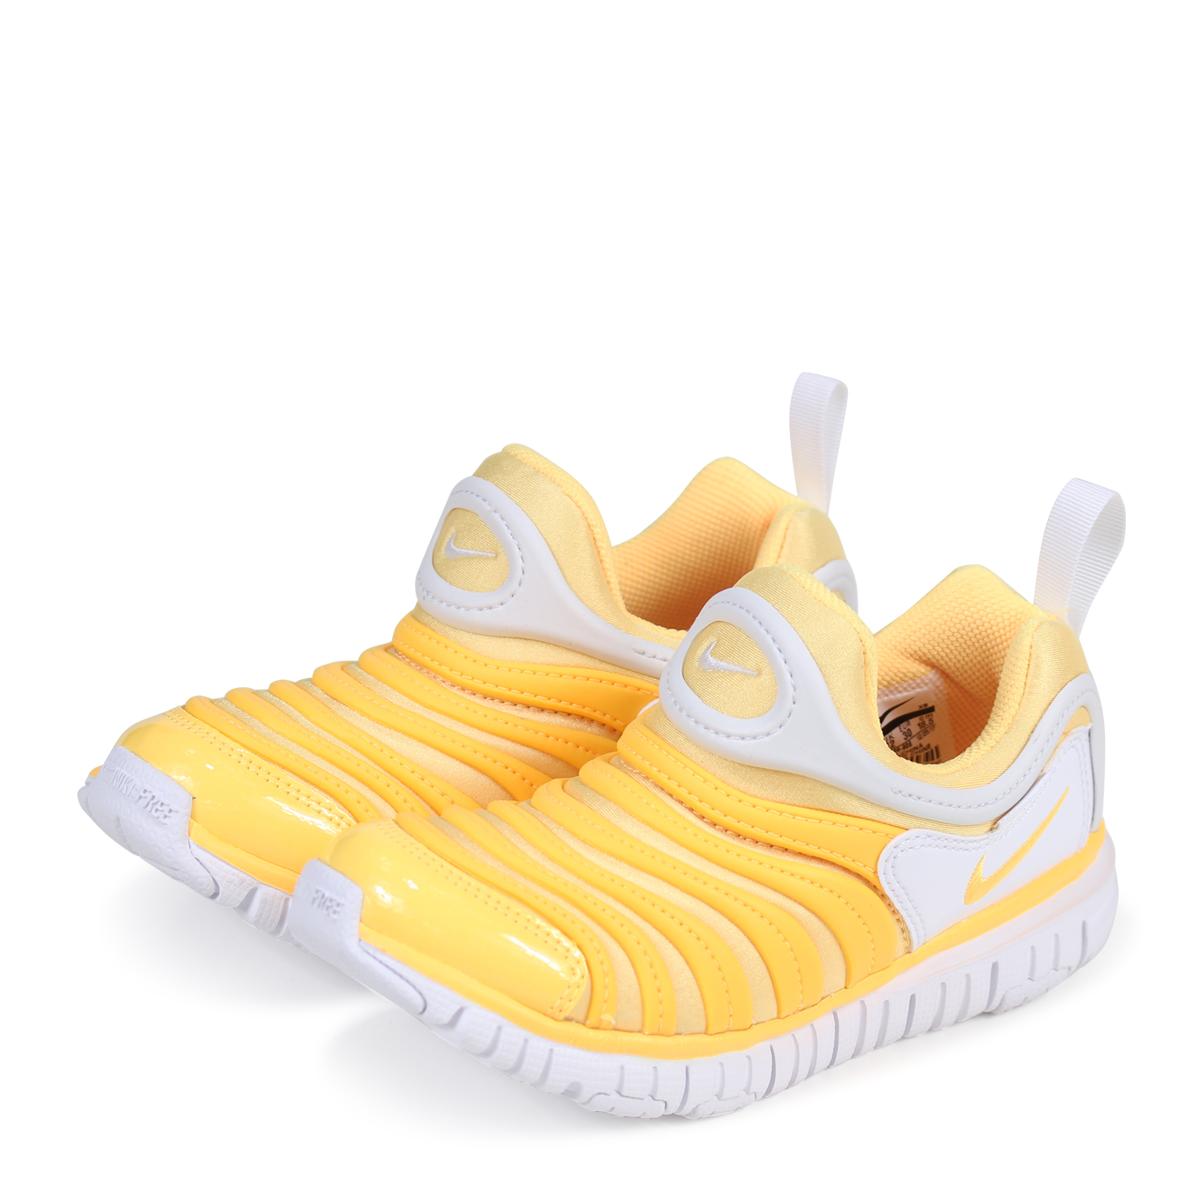 huge discount f1647 ece25 NIKE DYNAMO FREE PS Nike dynamo-free kids sneakers 343,738-806 yellow  3 ...